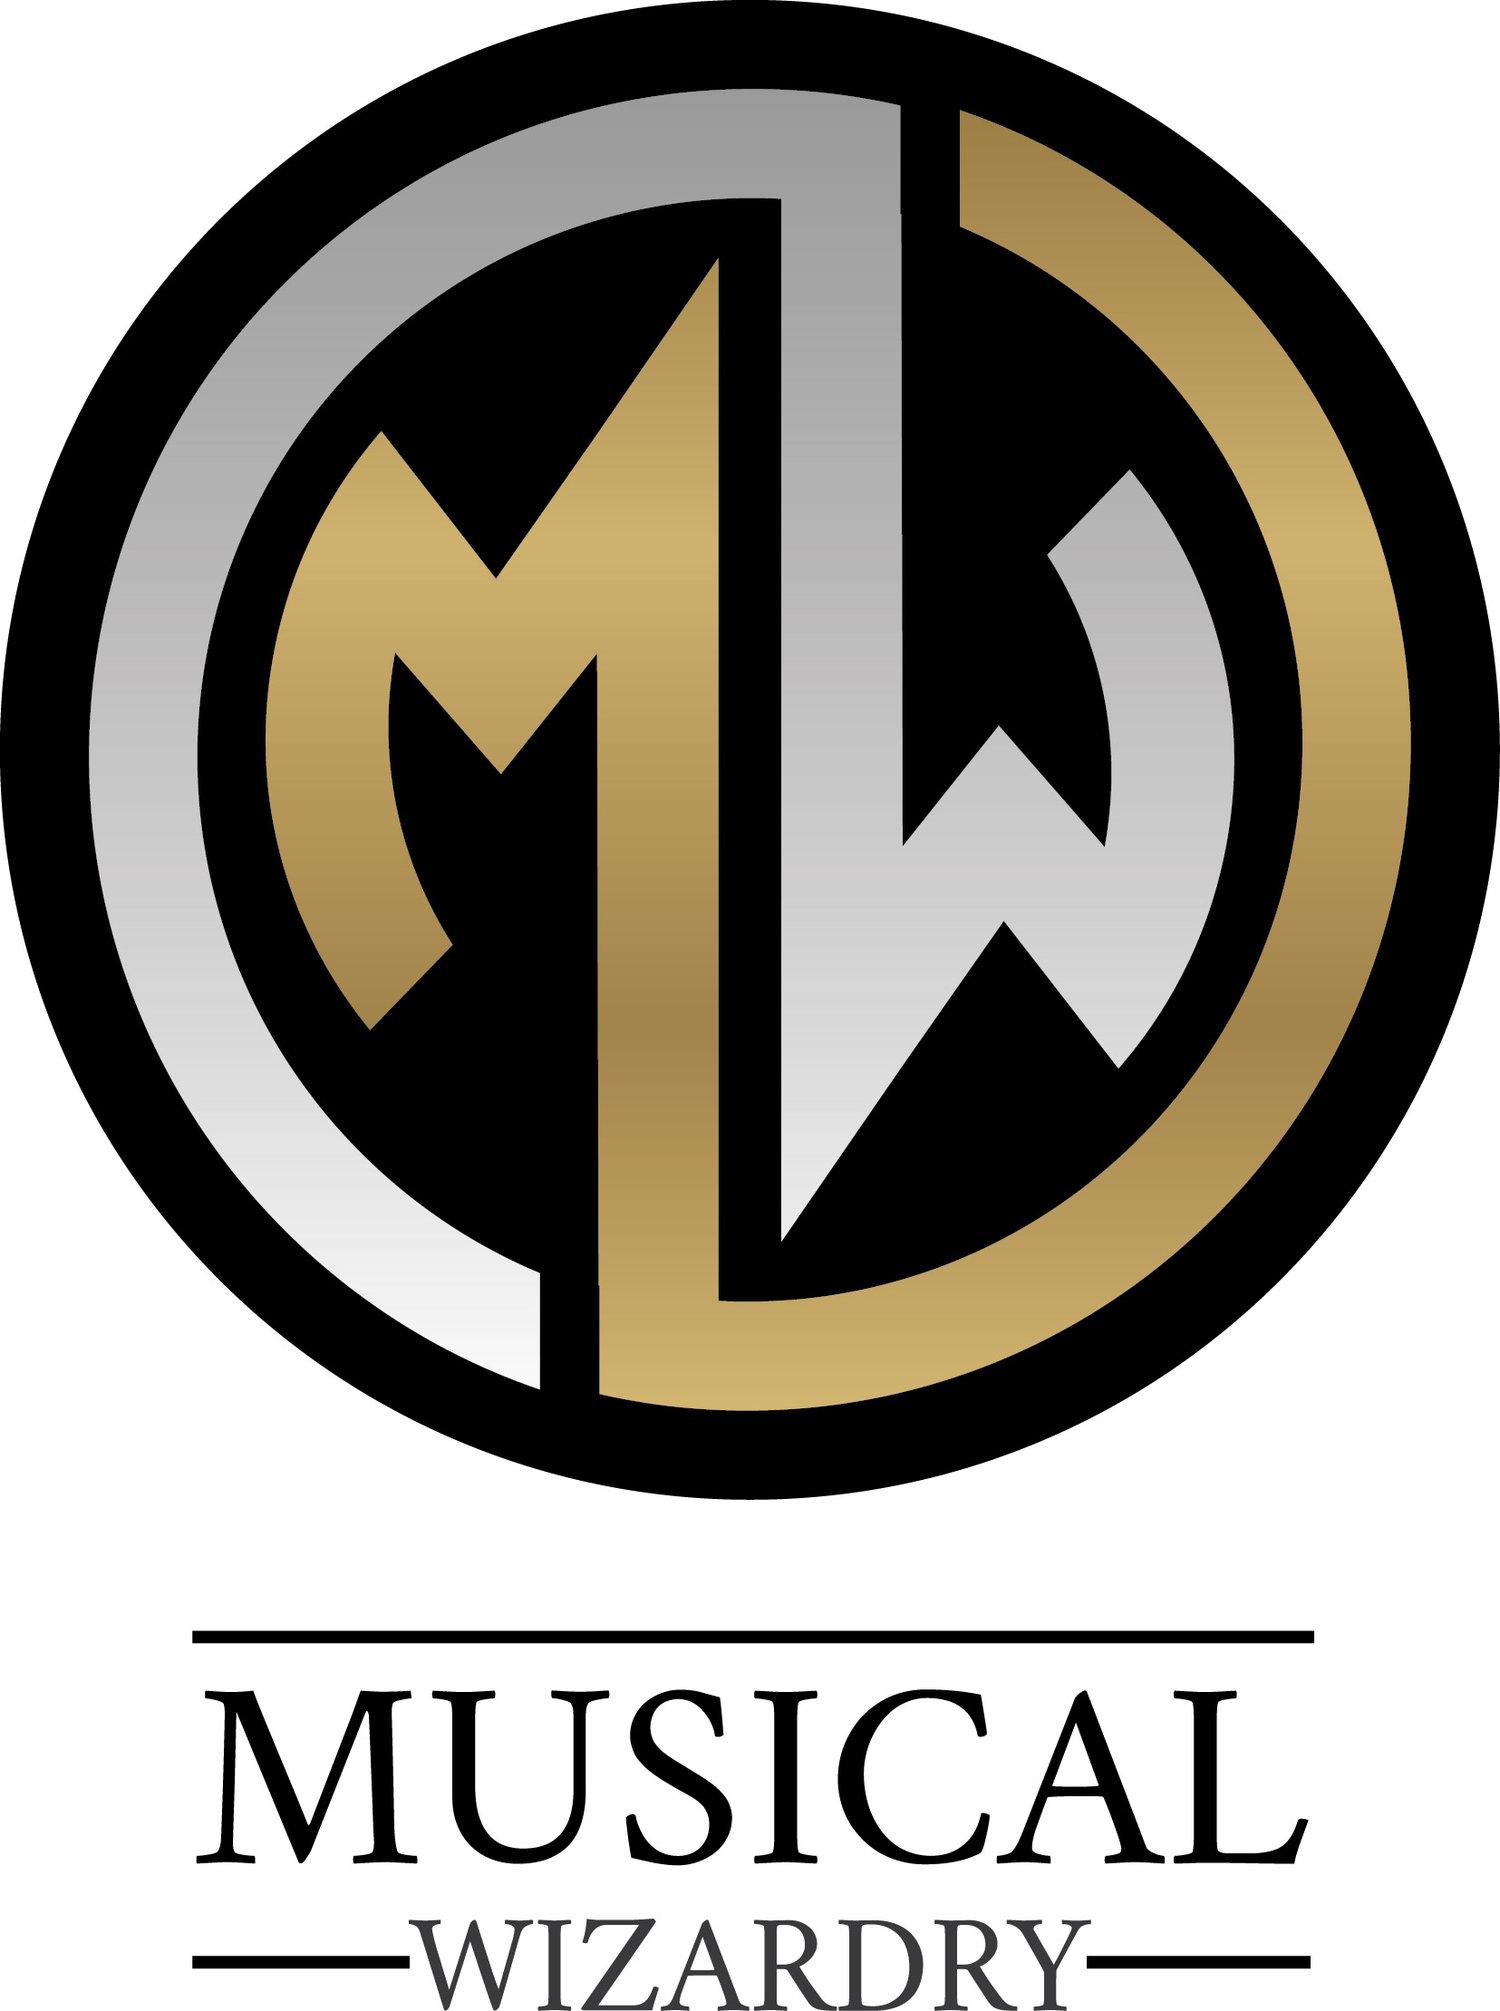 Musical Wizardry - Marco Iannello - Credits